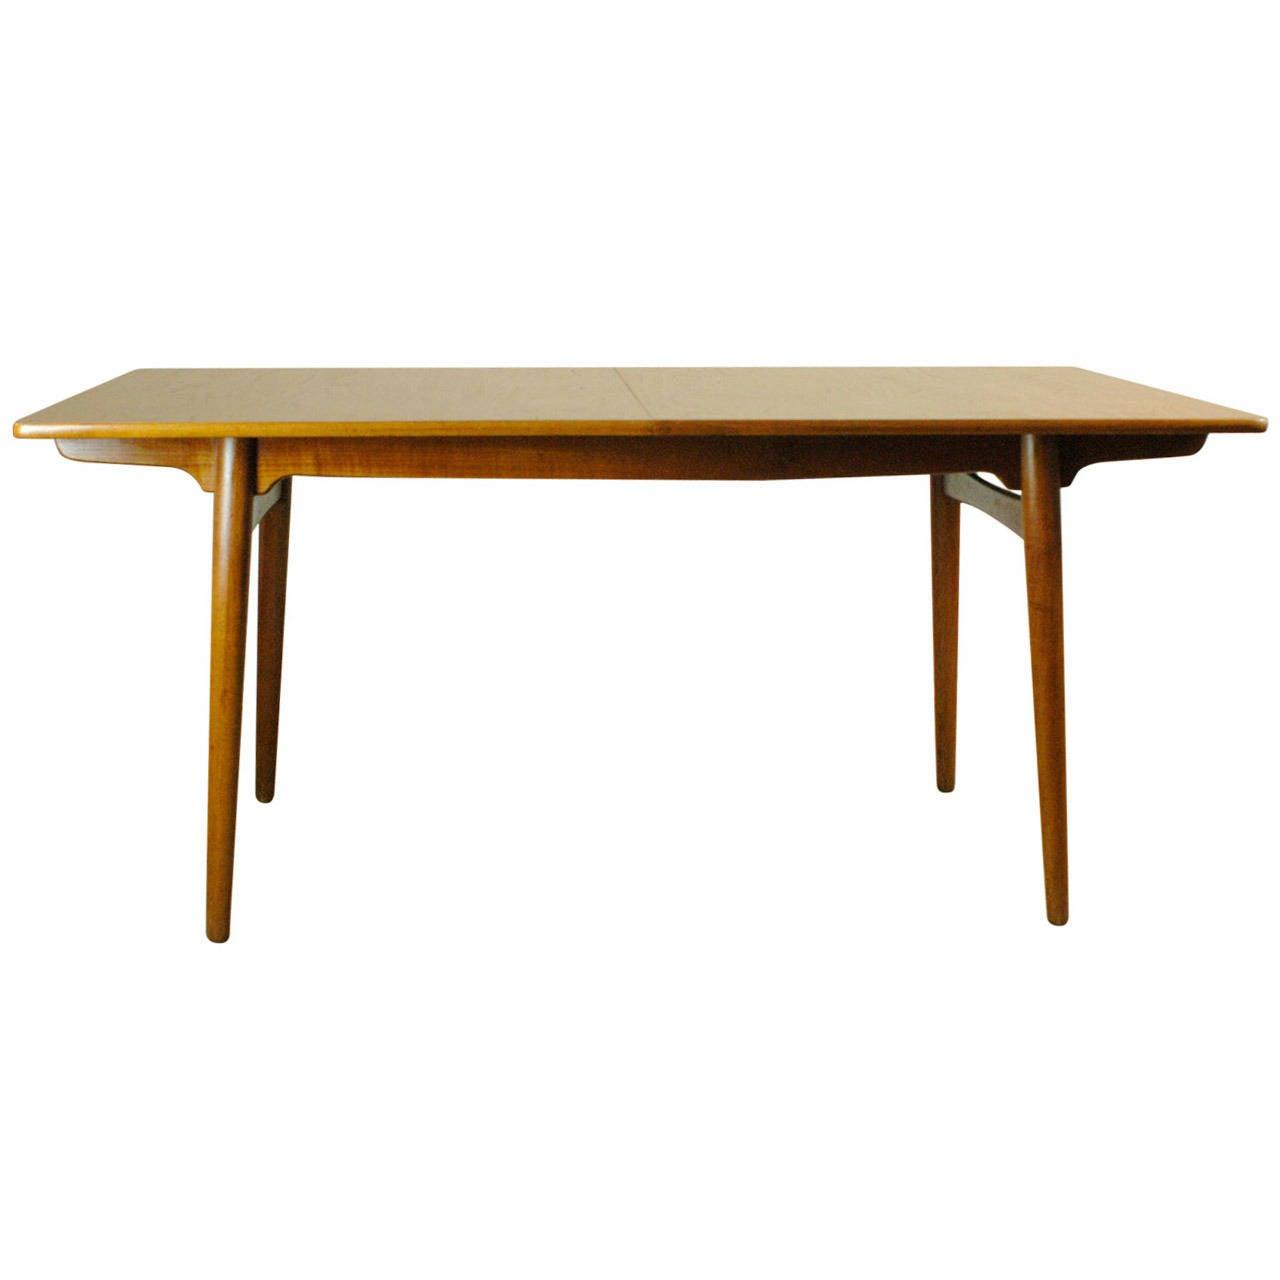 Danish Teak Extension Dining Table By Hans J Wegner At 1stdibs